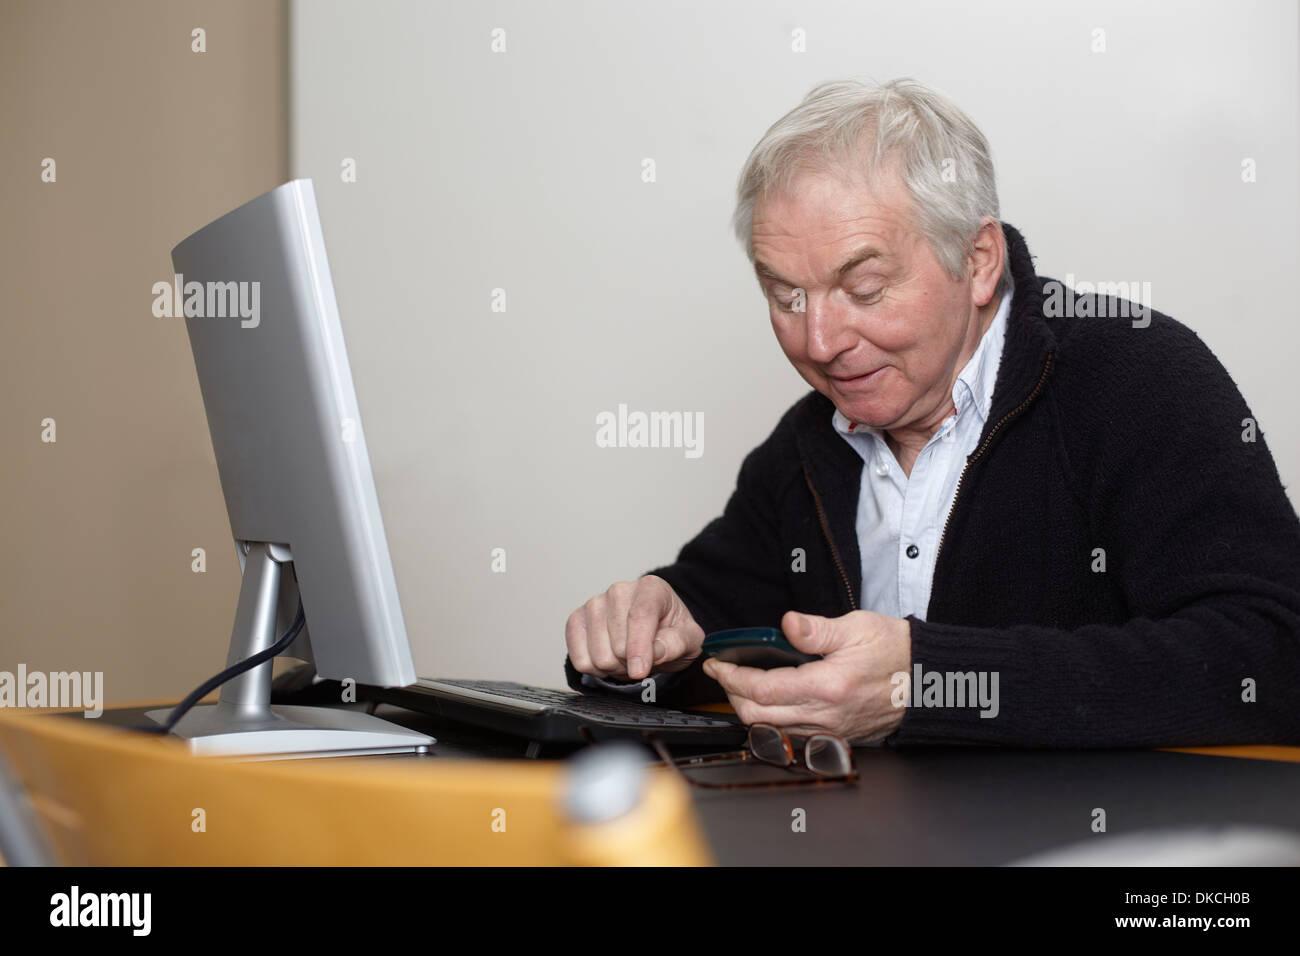 Senior man at home using personal computer - Stock Image